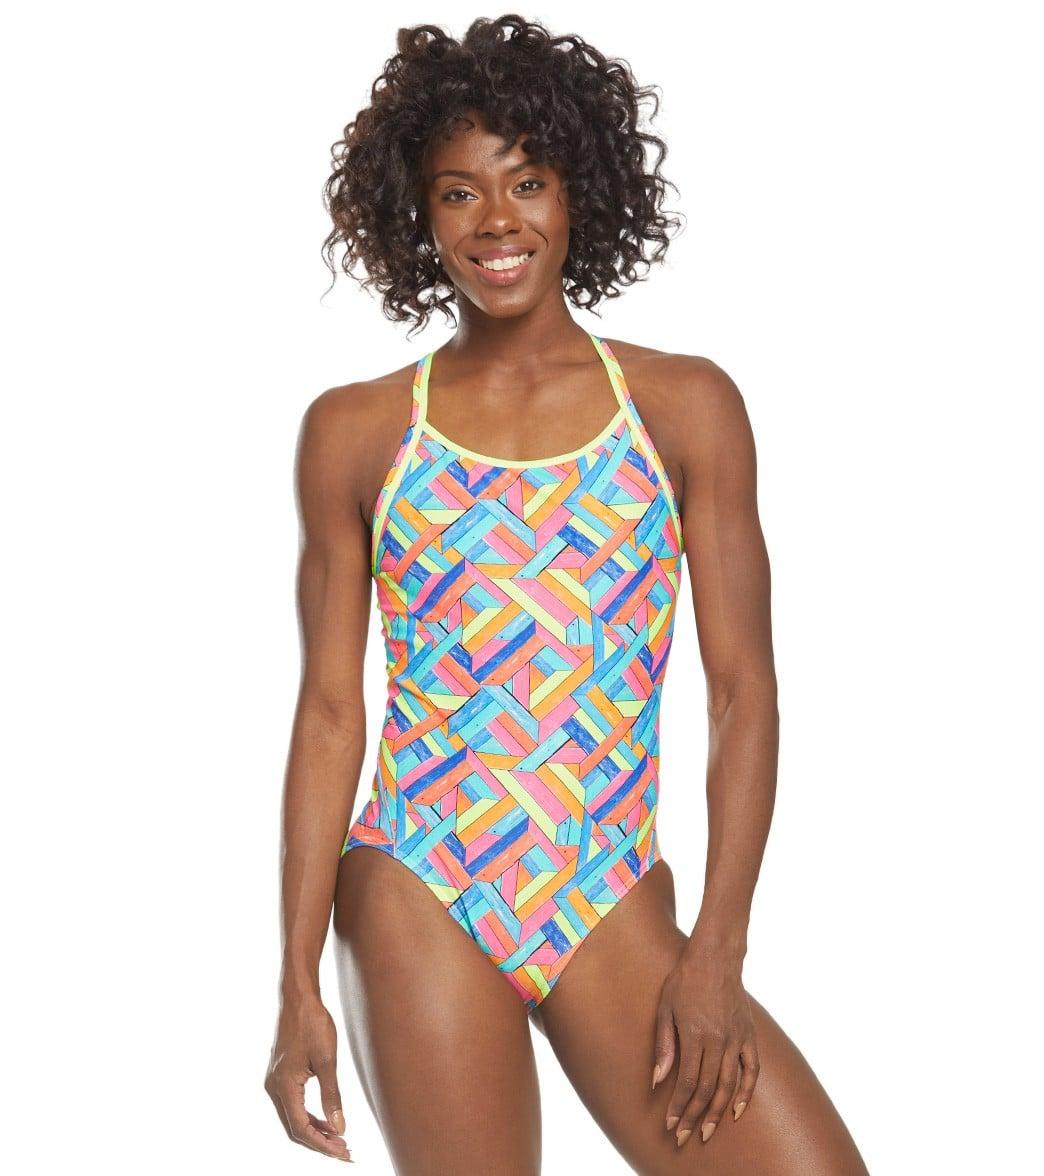 Funkita Women's Panel Pop Diamond Back One Piece Swimsuit